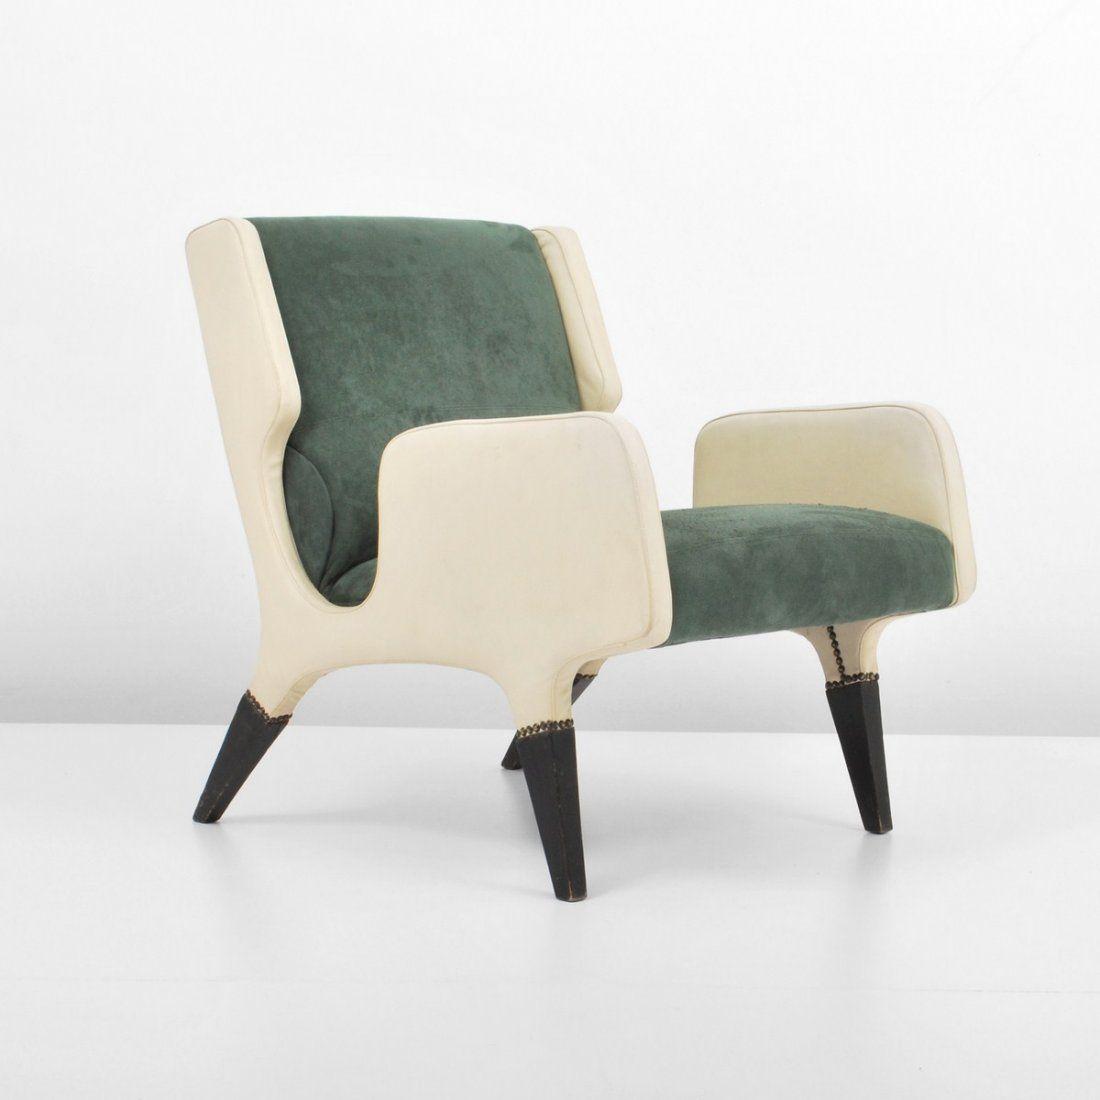 150 Gio Ponti Lounge Chair Parco Dei Principi Gio